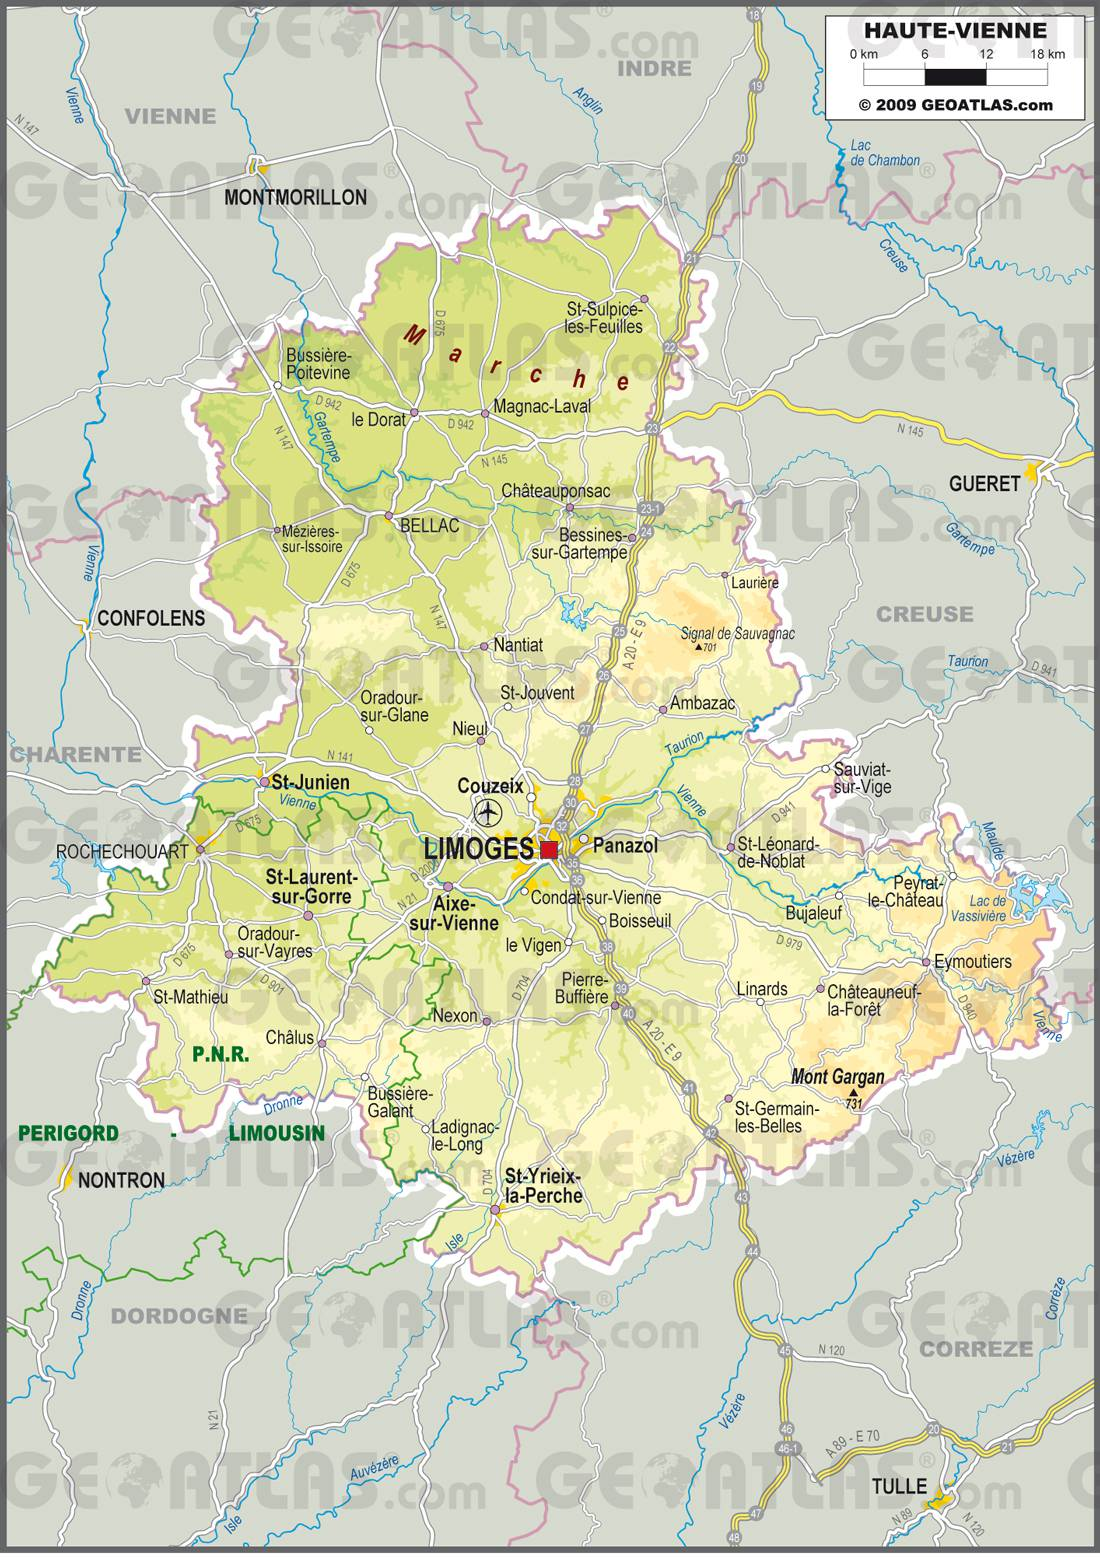 Carte de la Haute-Vienne